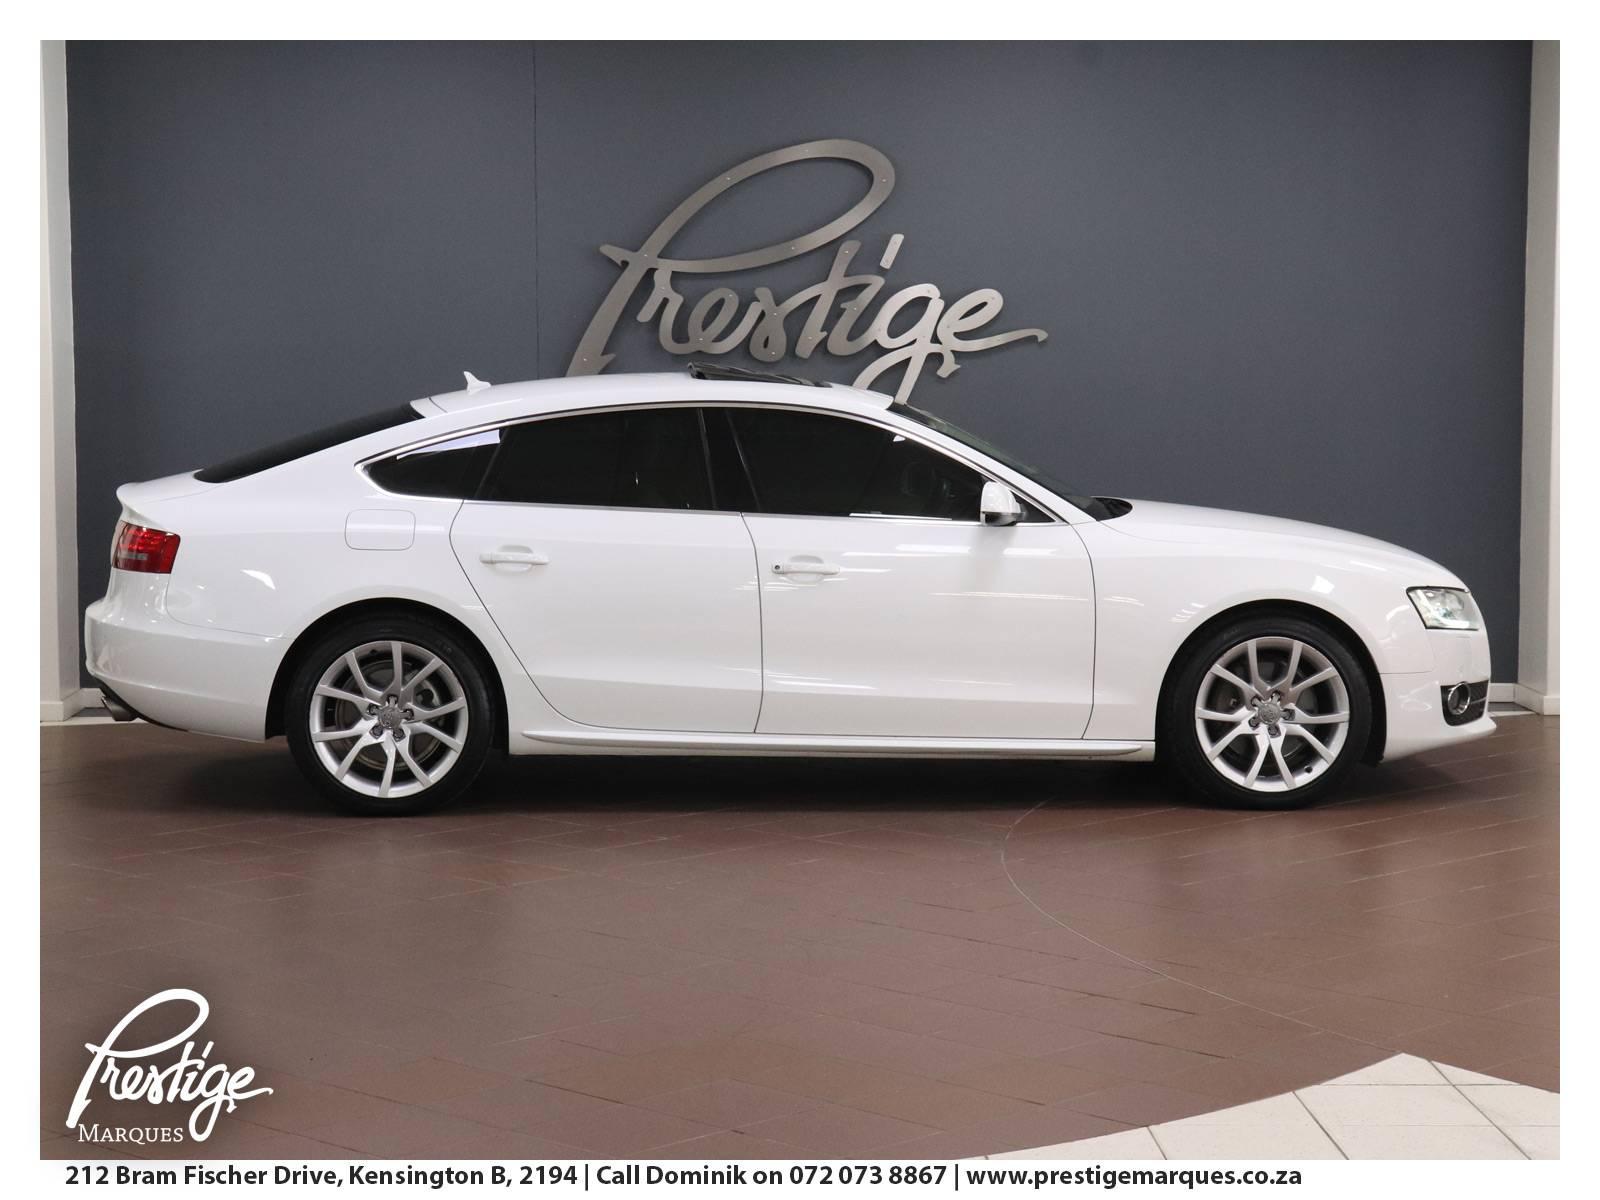 2011-Audi-A5-3.0-TDI-Quattro-Stronic-Prestige-Marques-Randburg-Sandton-2